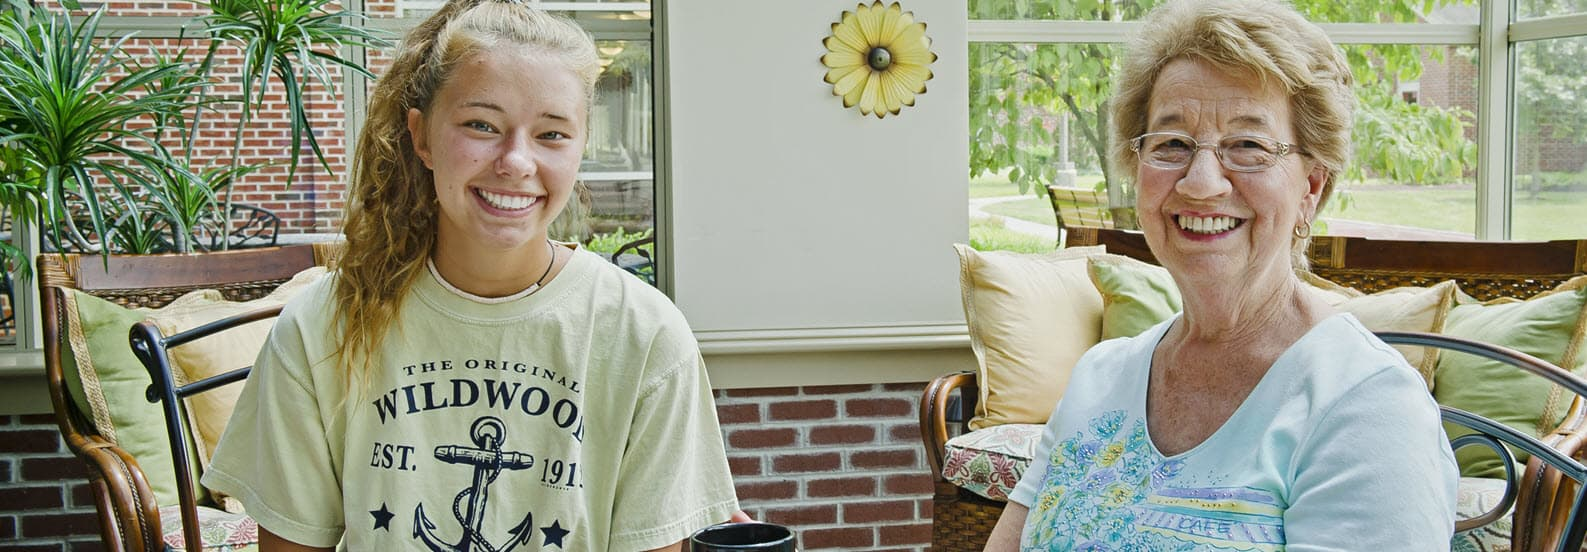 senior with grandchild